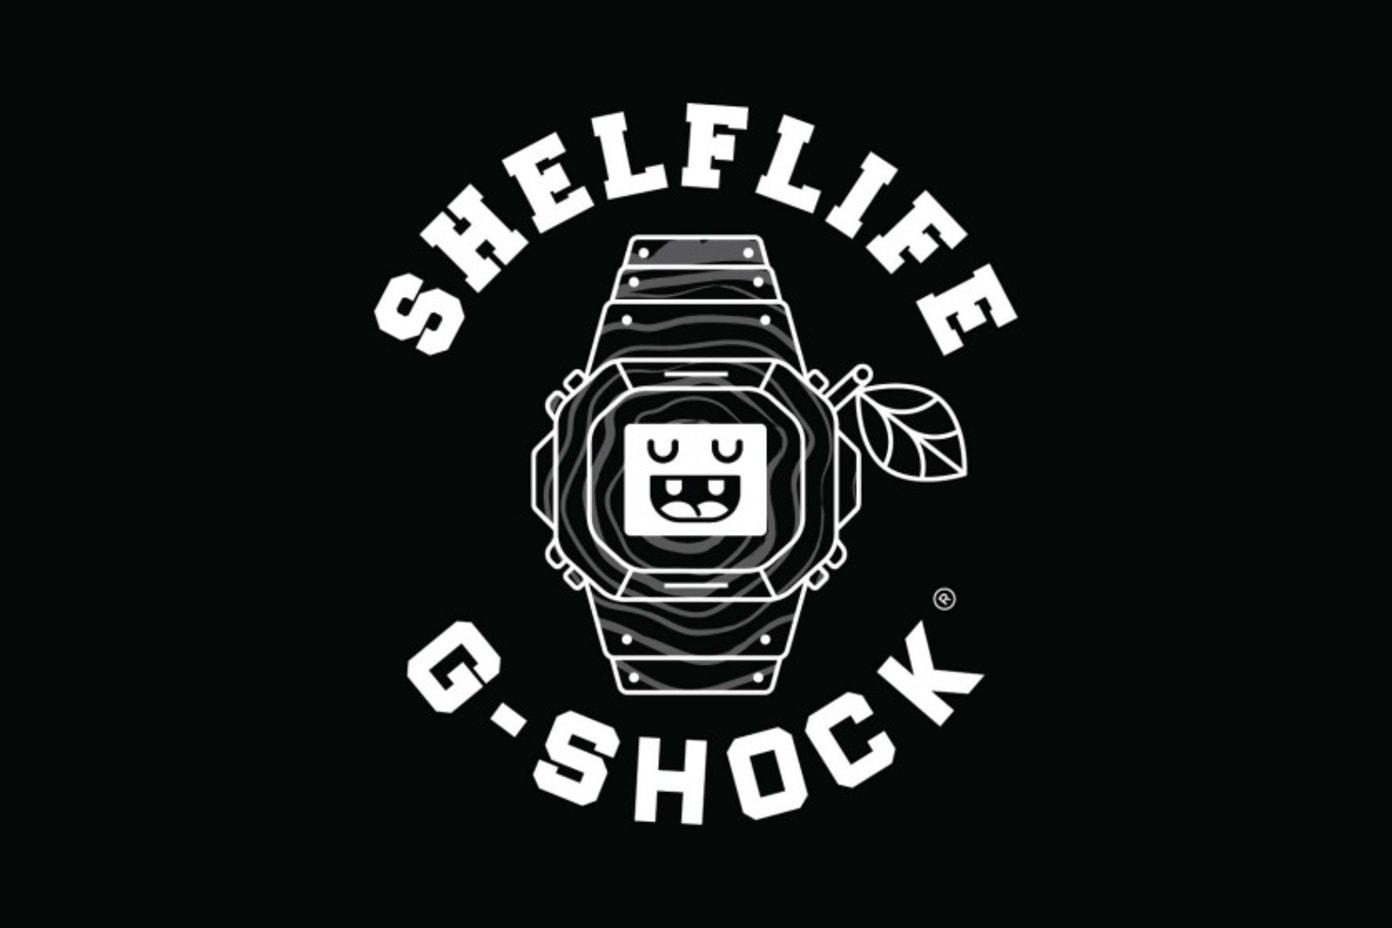 Shelflife X G-Shock Watch Collaboration